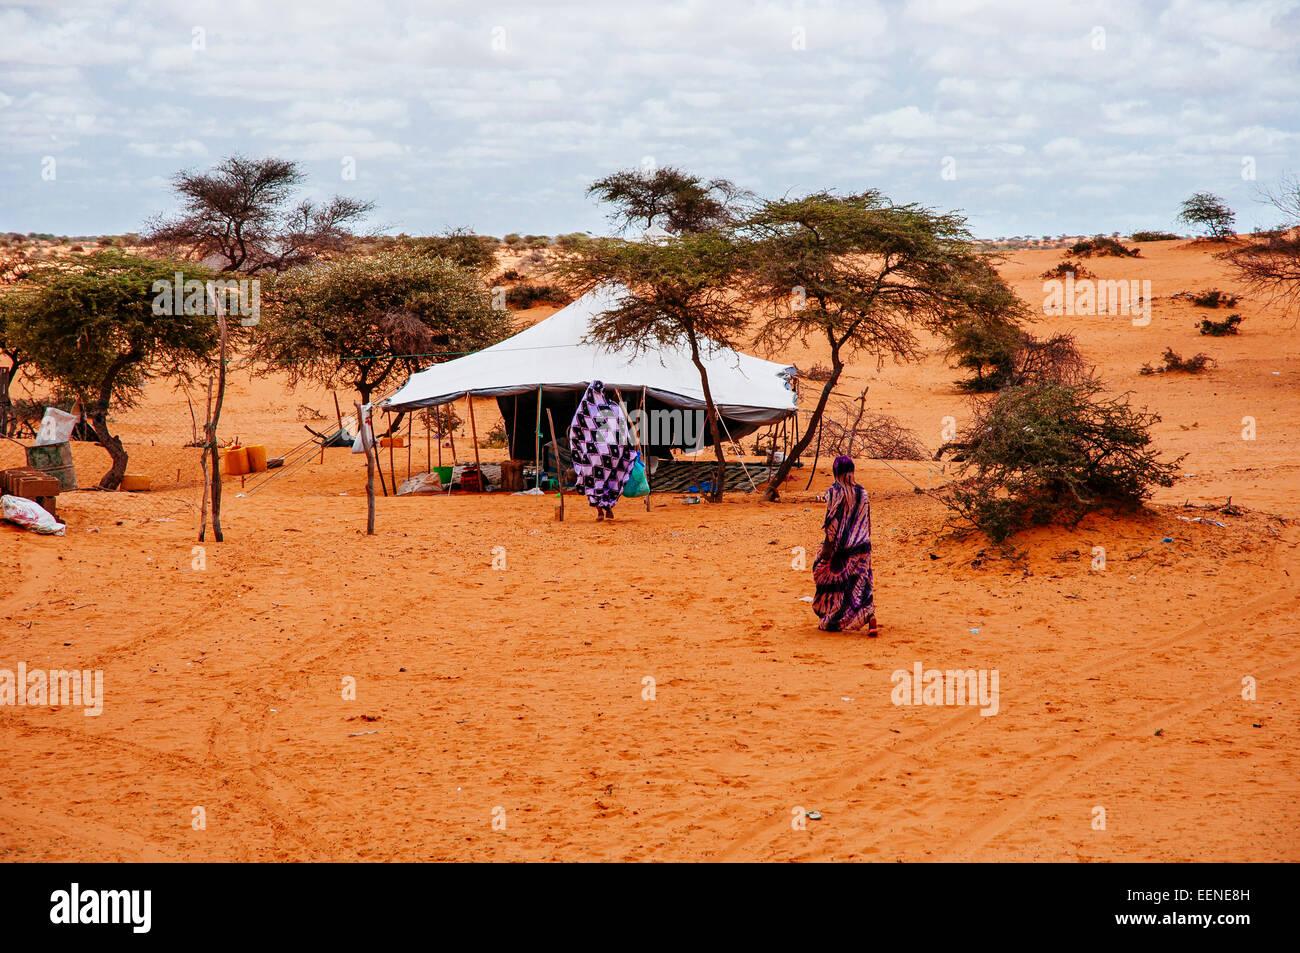 Nomadic people´s  tent on the Sahara desert, Mauritania. - Stock Image